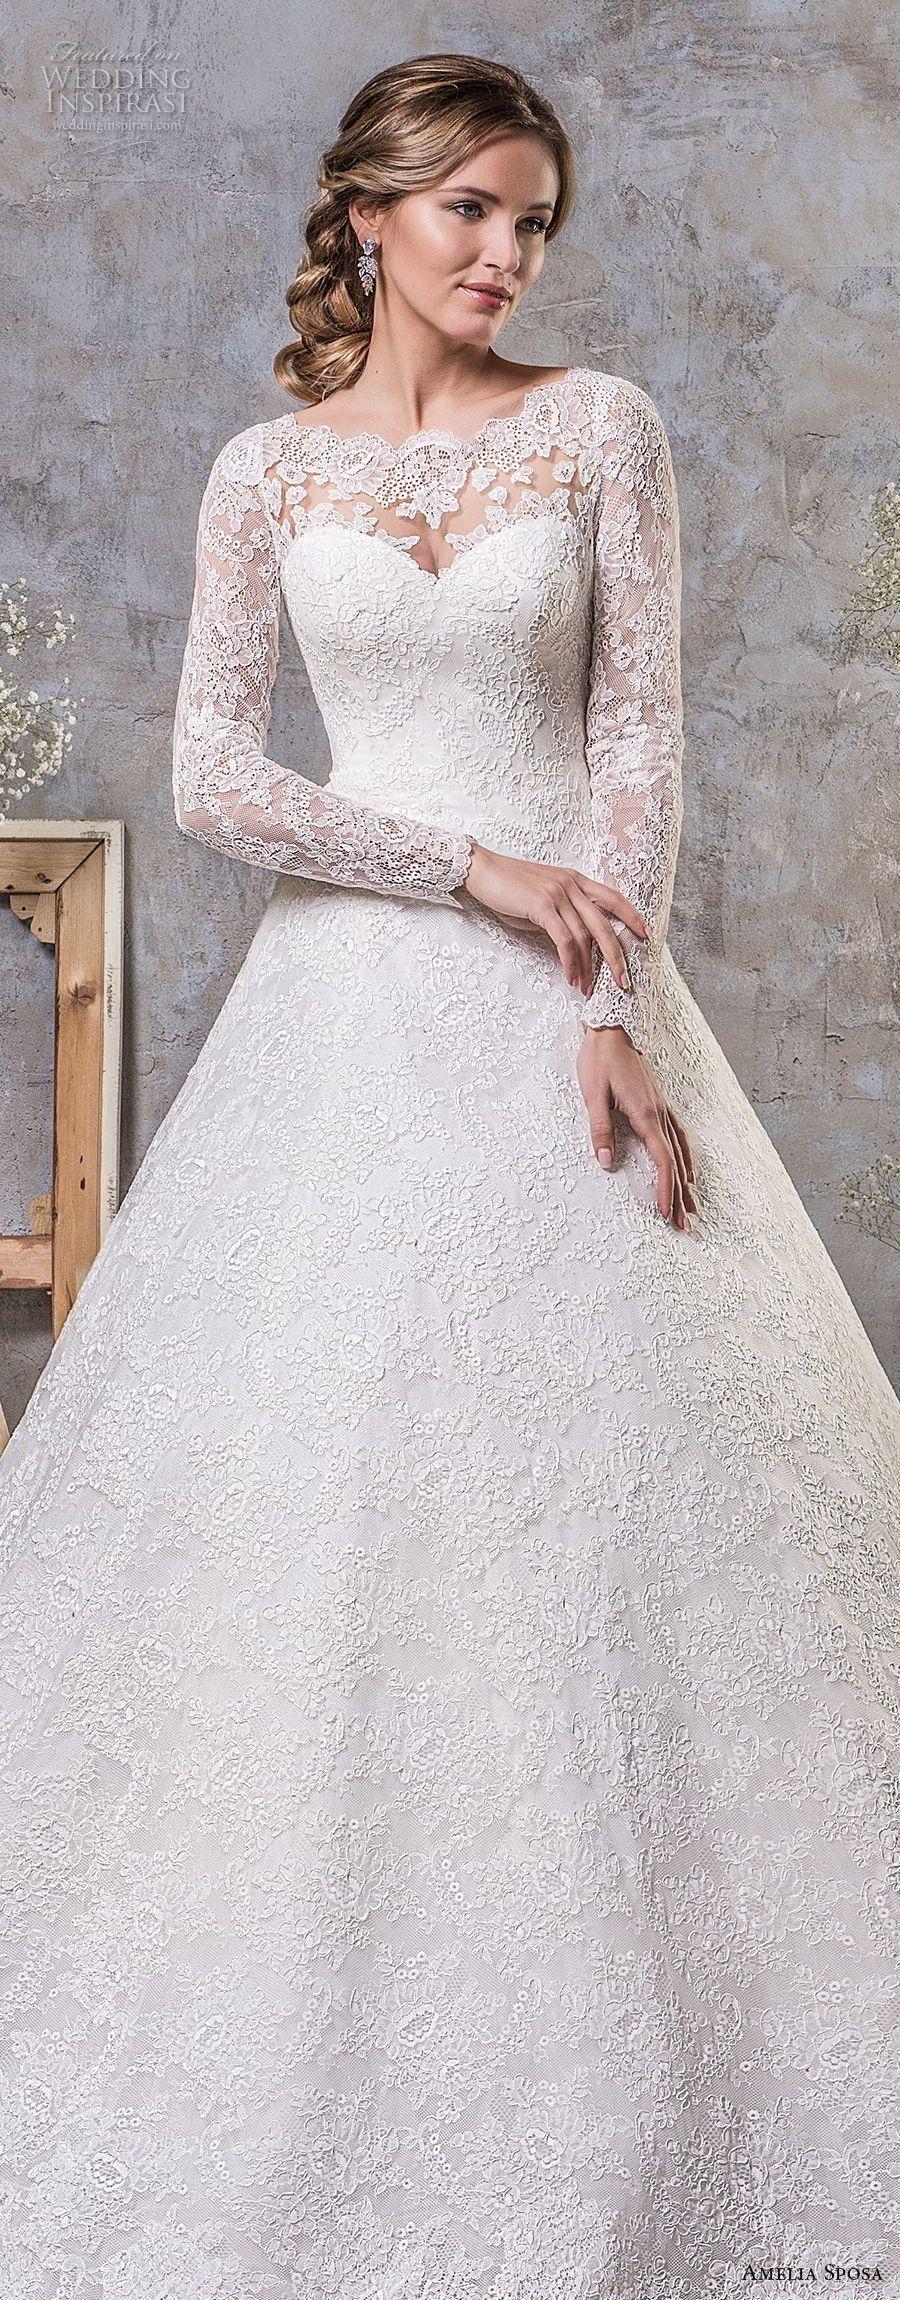 Amelia sposa fall wedding dresses amelia sposa chapel train